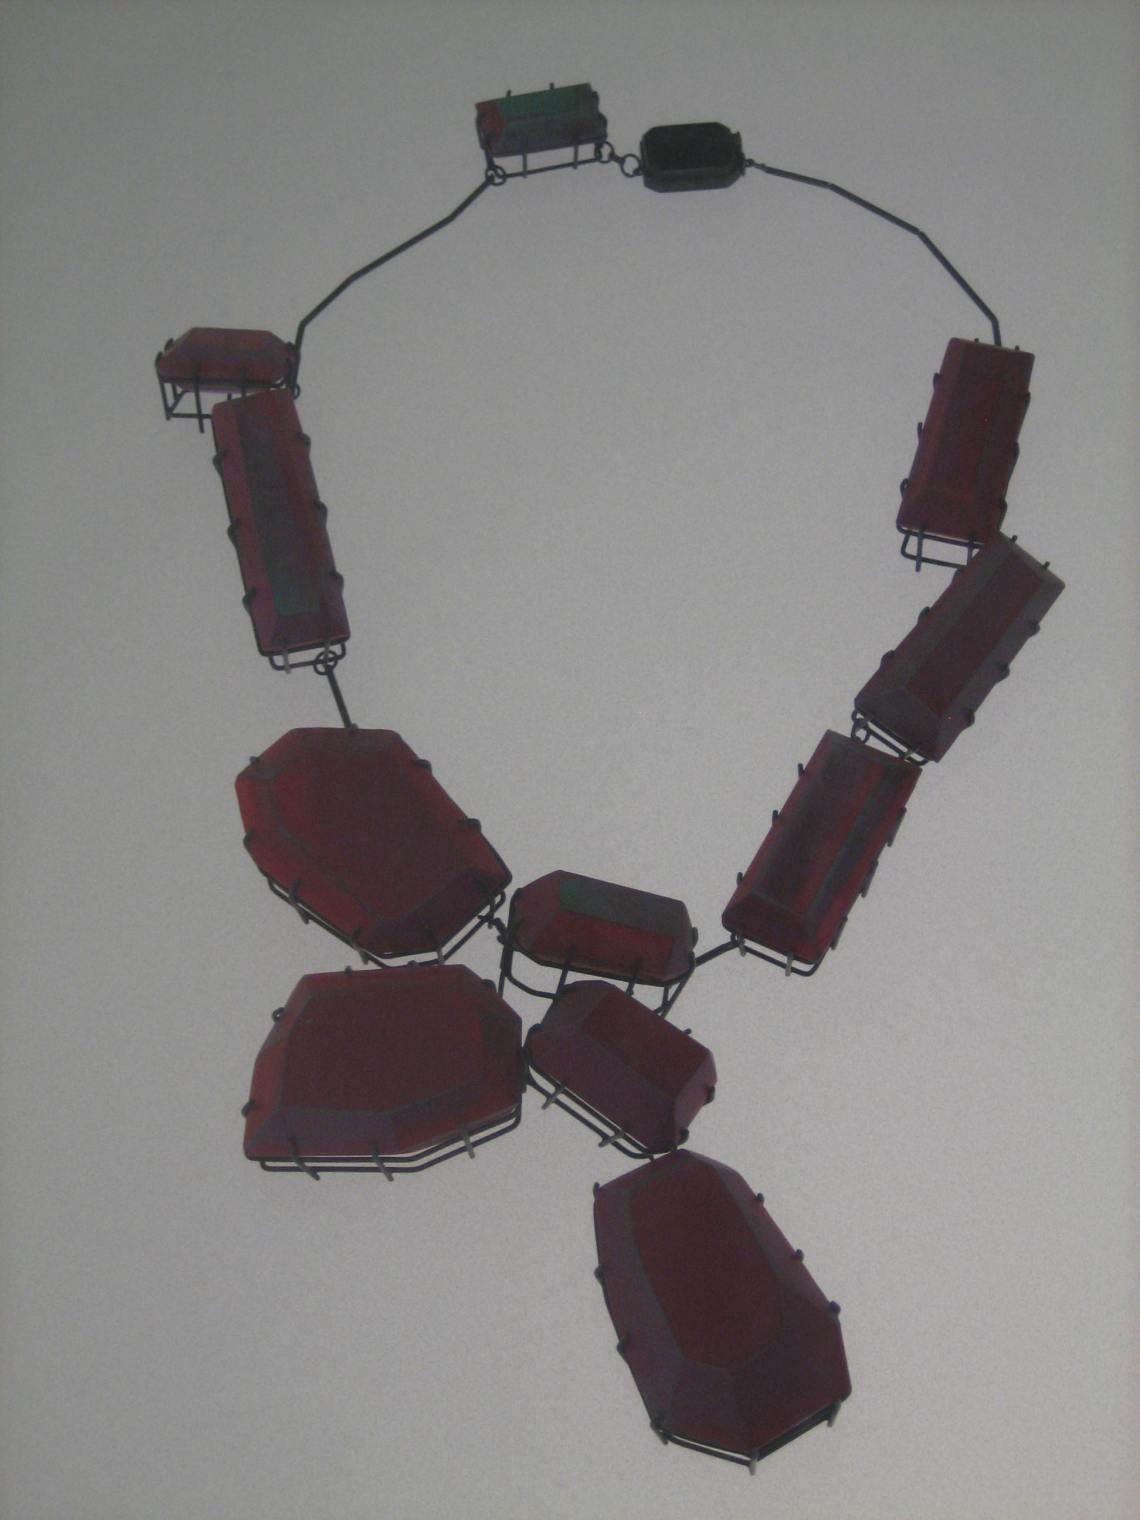 Lilli Veers, Pink Collier, halssieraad, 2012. Collectie Grassimuseum. Foto Esther Doornbusch, mei 2018, CC BY 4.0